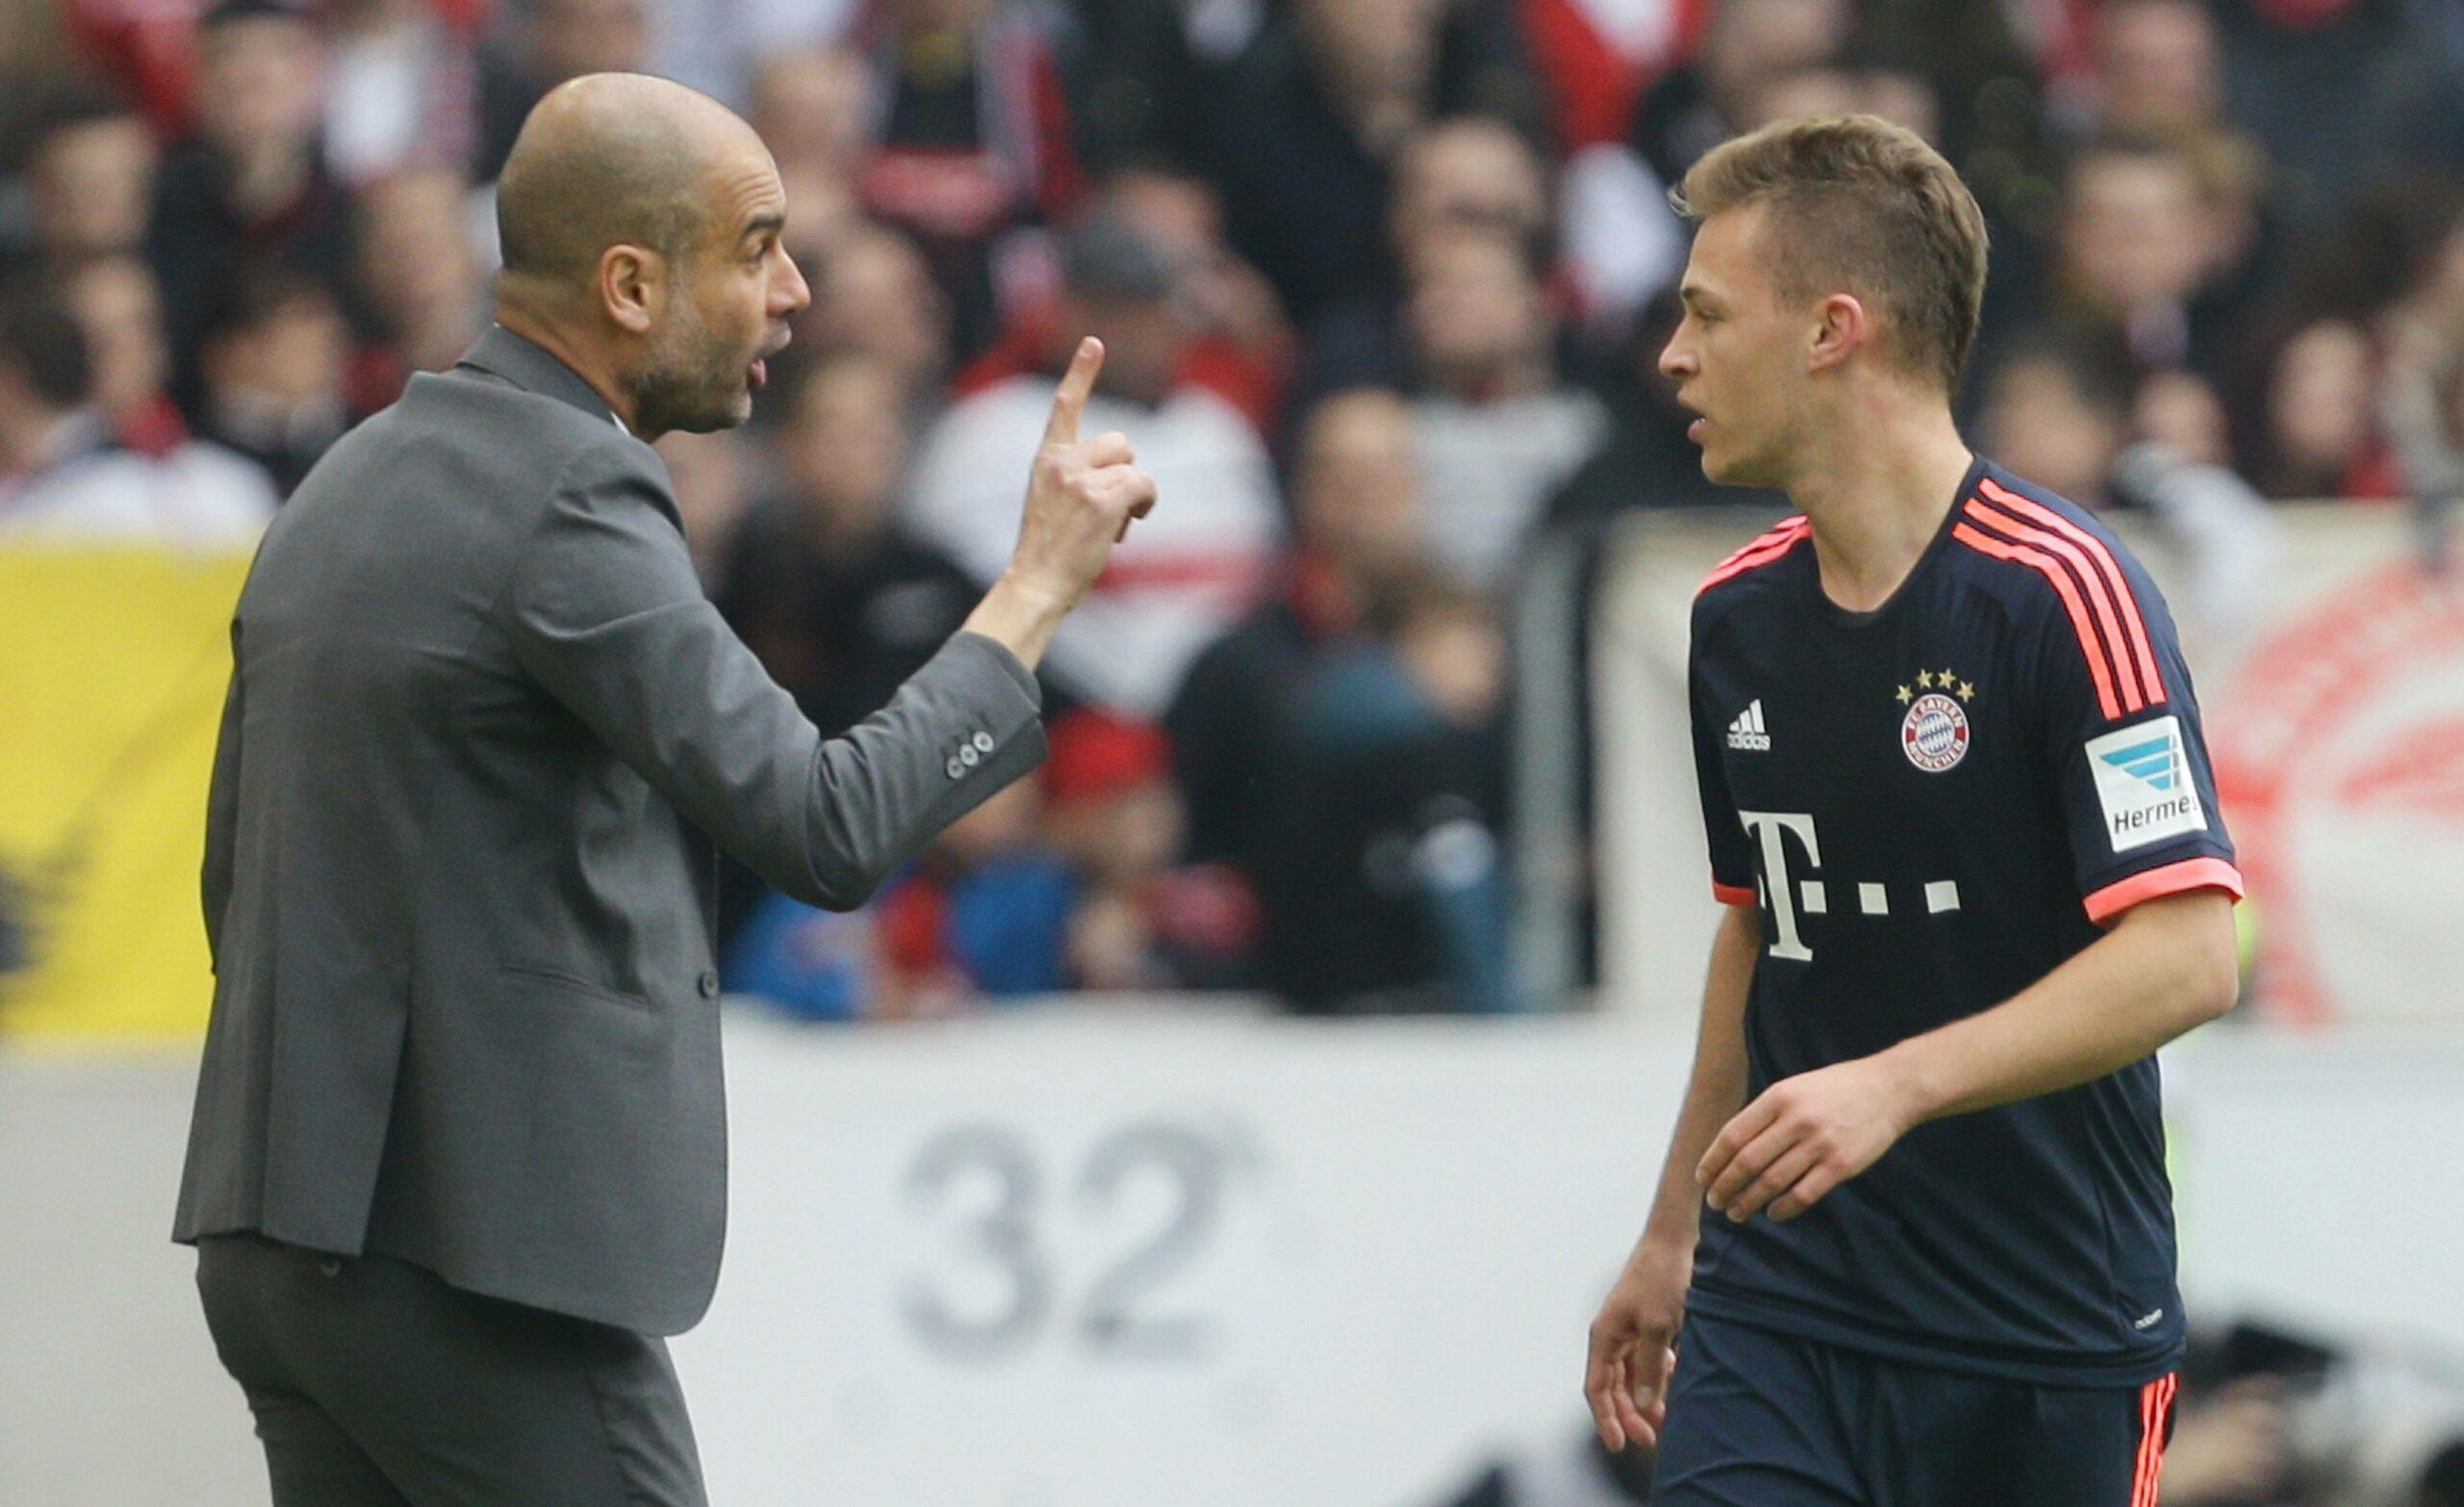 Nach Alaba-Interesse: Guardiola nimmt auch Joshua Kimmich ins Visier - Aktuelle FC Bayern News ...